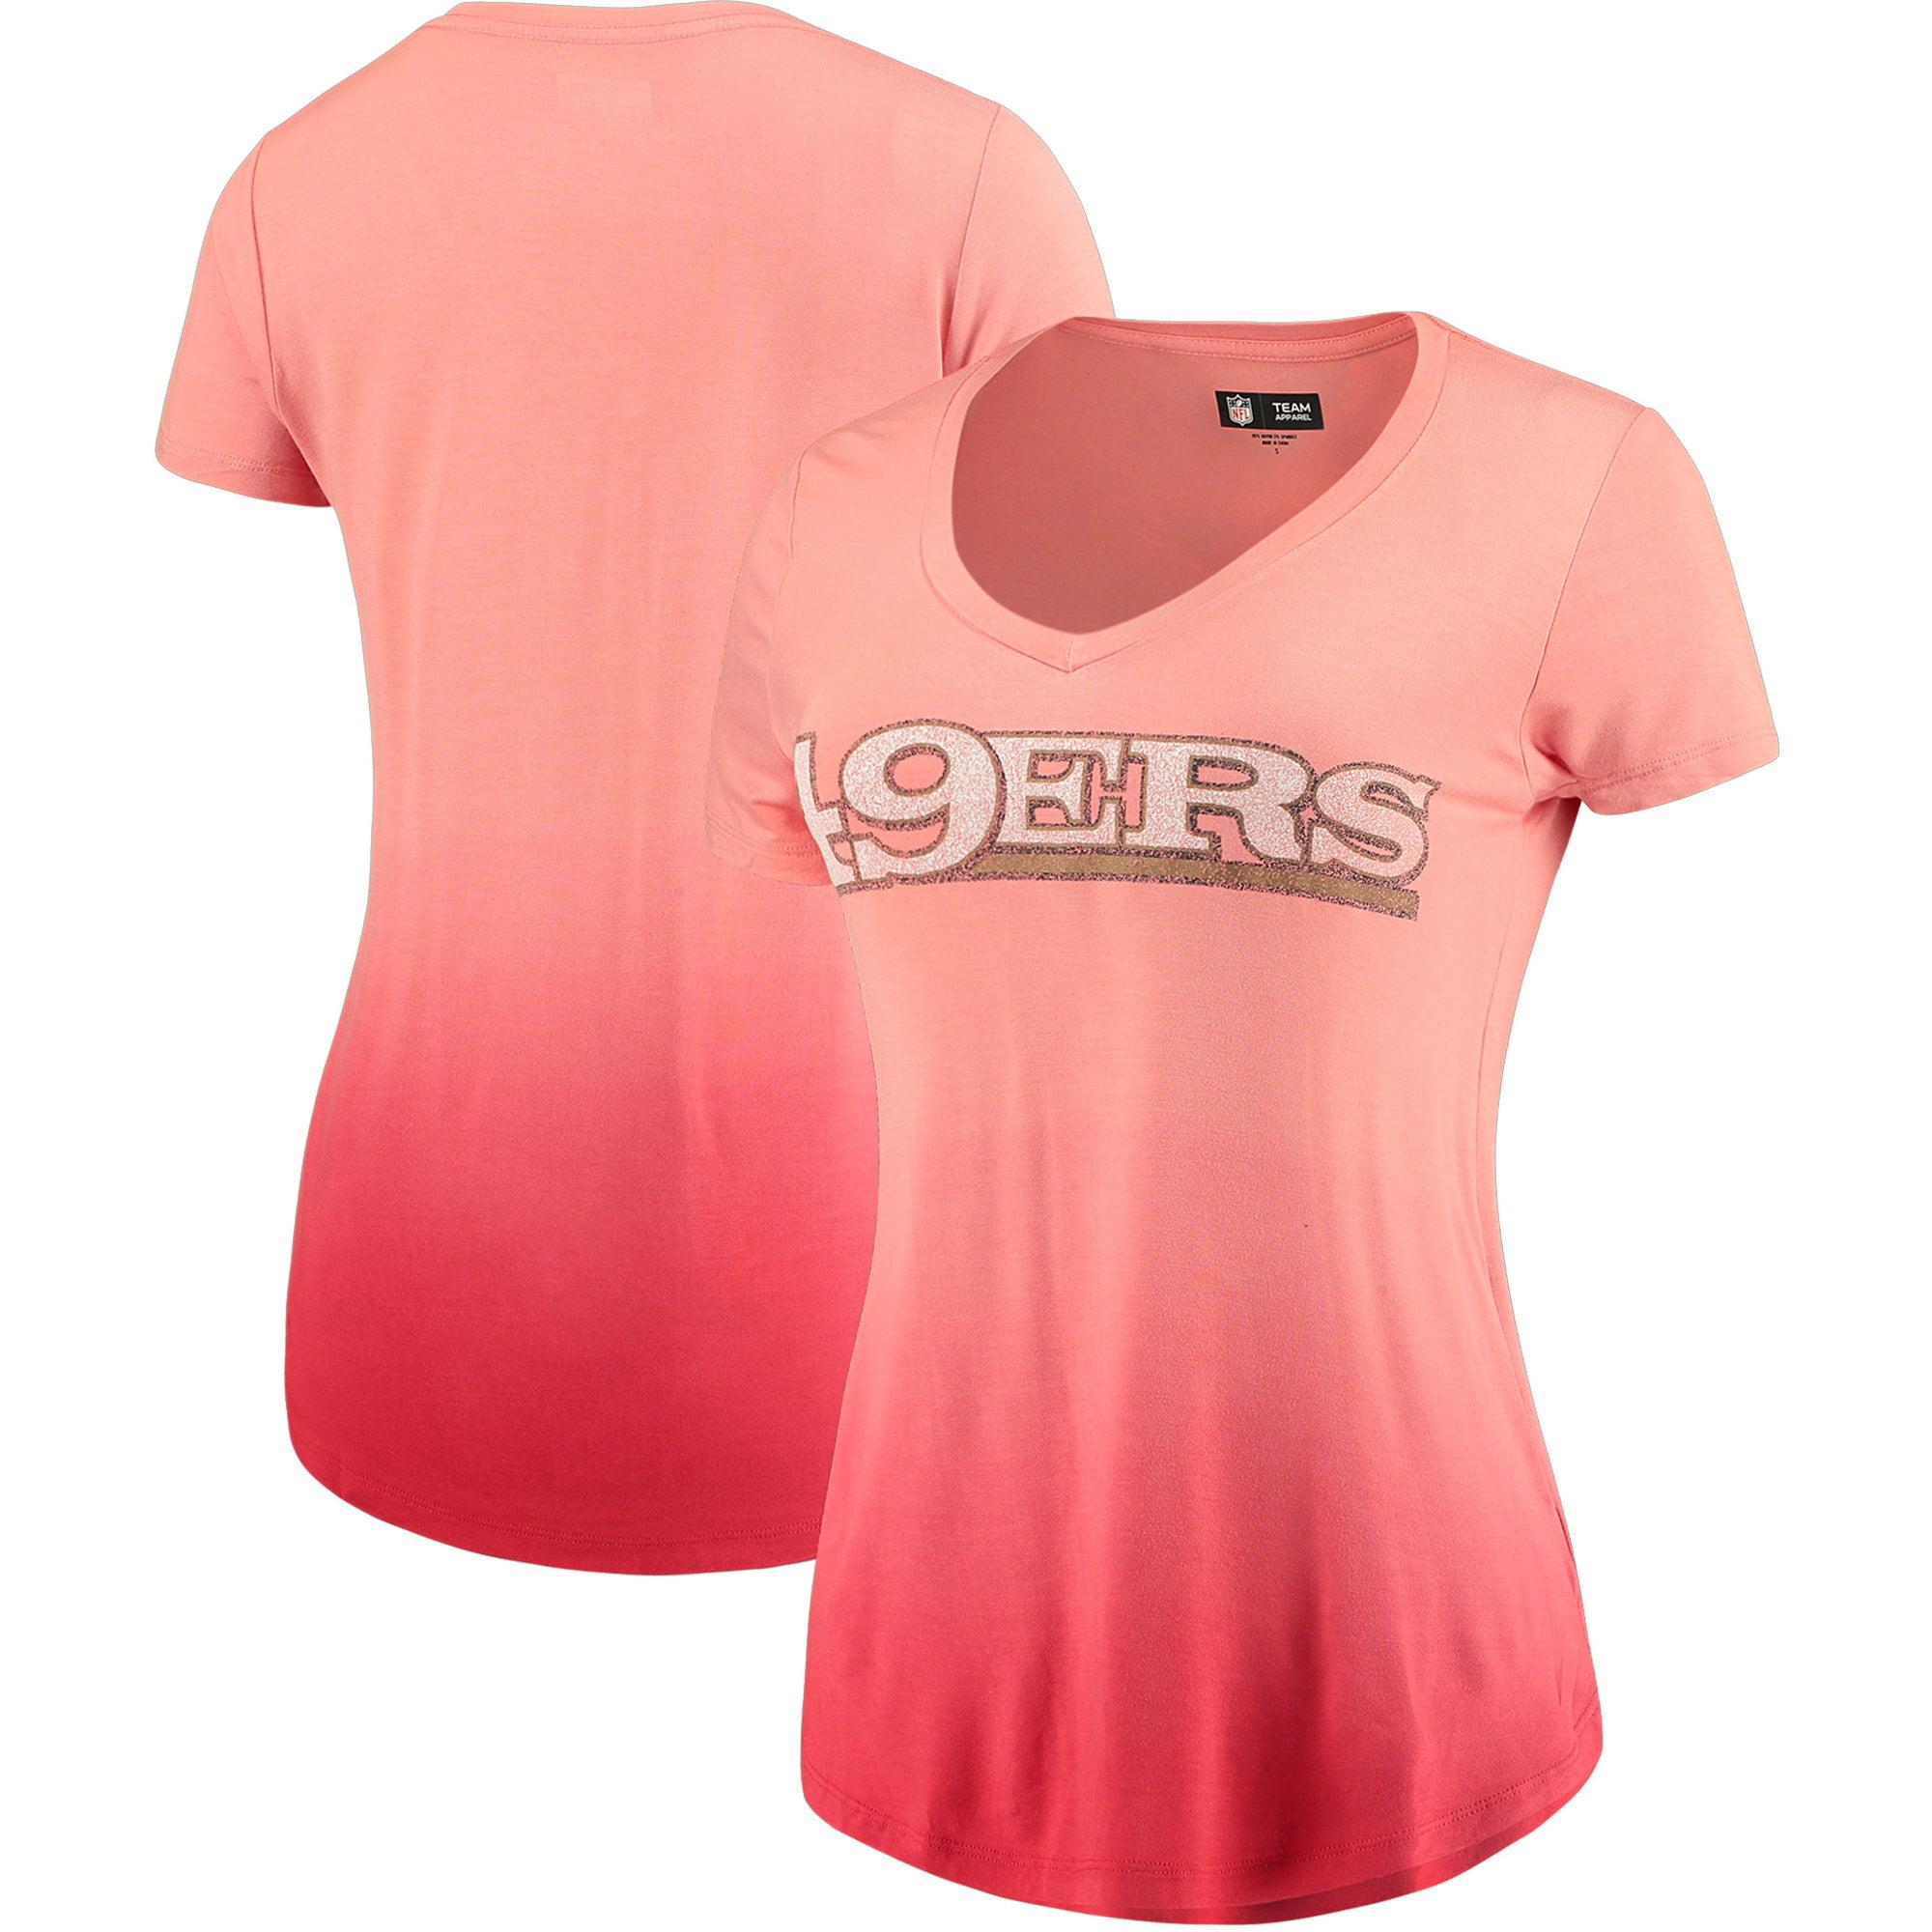 San Francisco 49ers 5th & Ocean by New Era Women's Dip Dye V-Neck T-Shirt - Scarlet